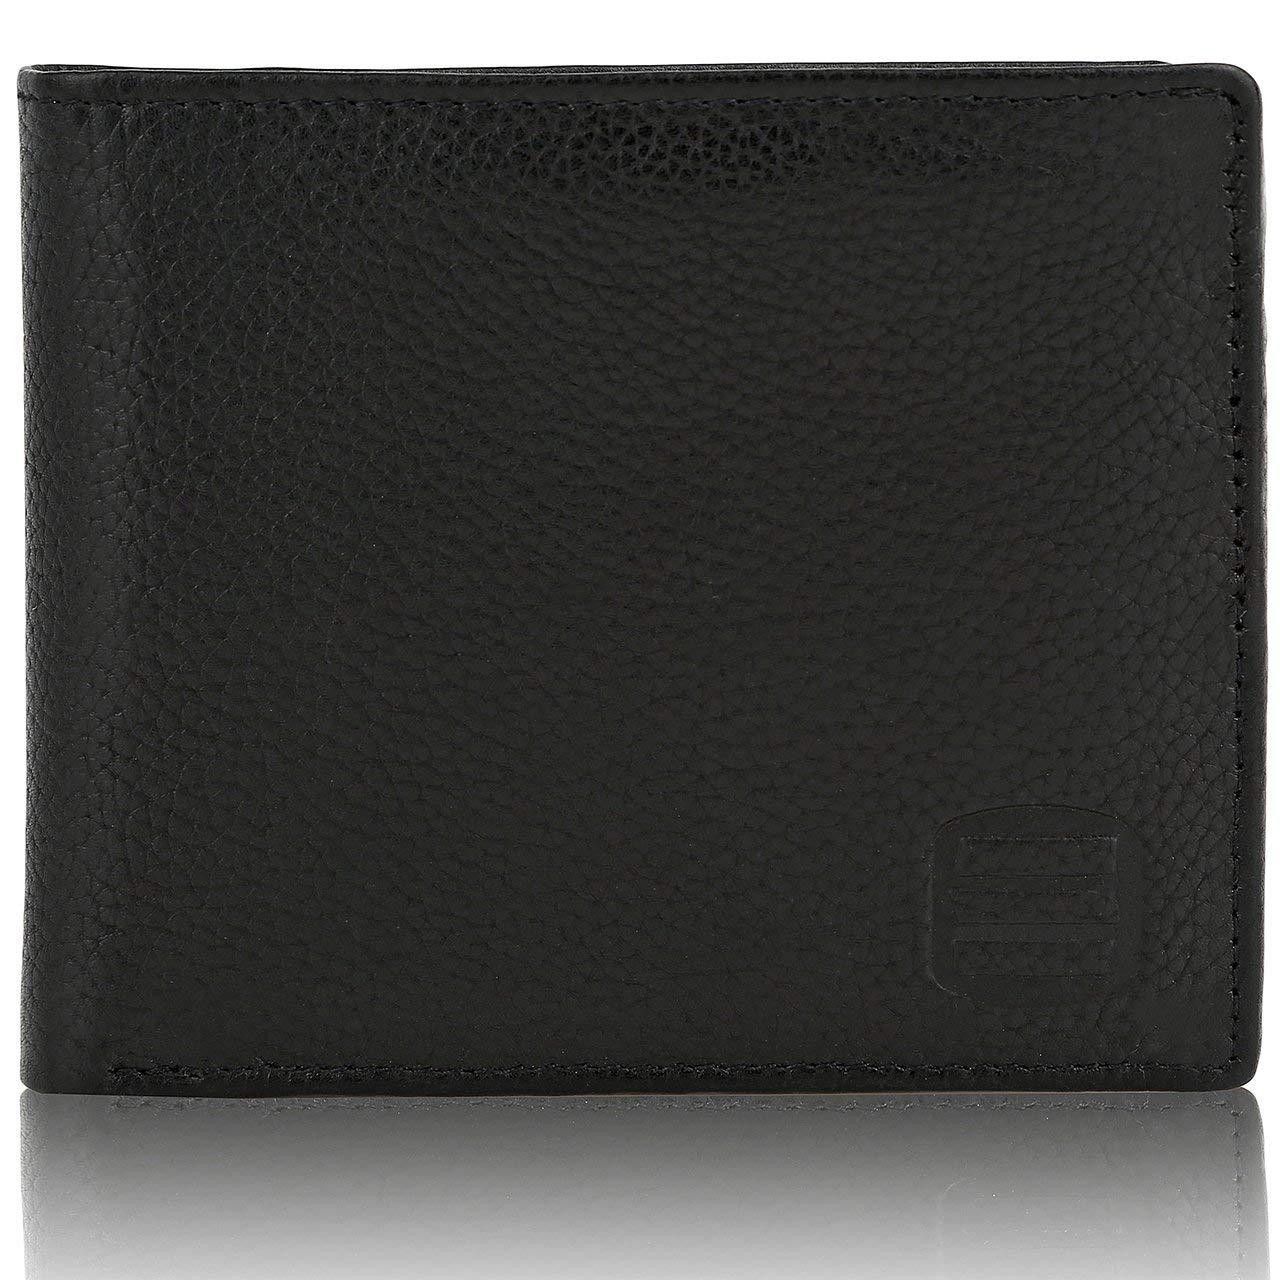 Suvelle Bifold Mens Genuine Leather RFID Blocking Slimfold Travel Wallet WR98